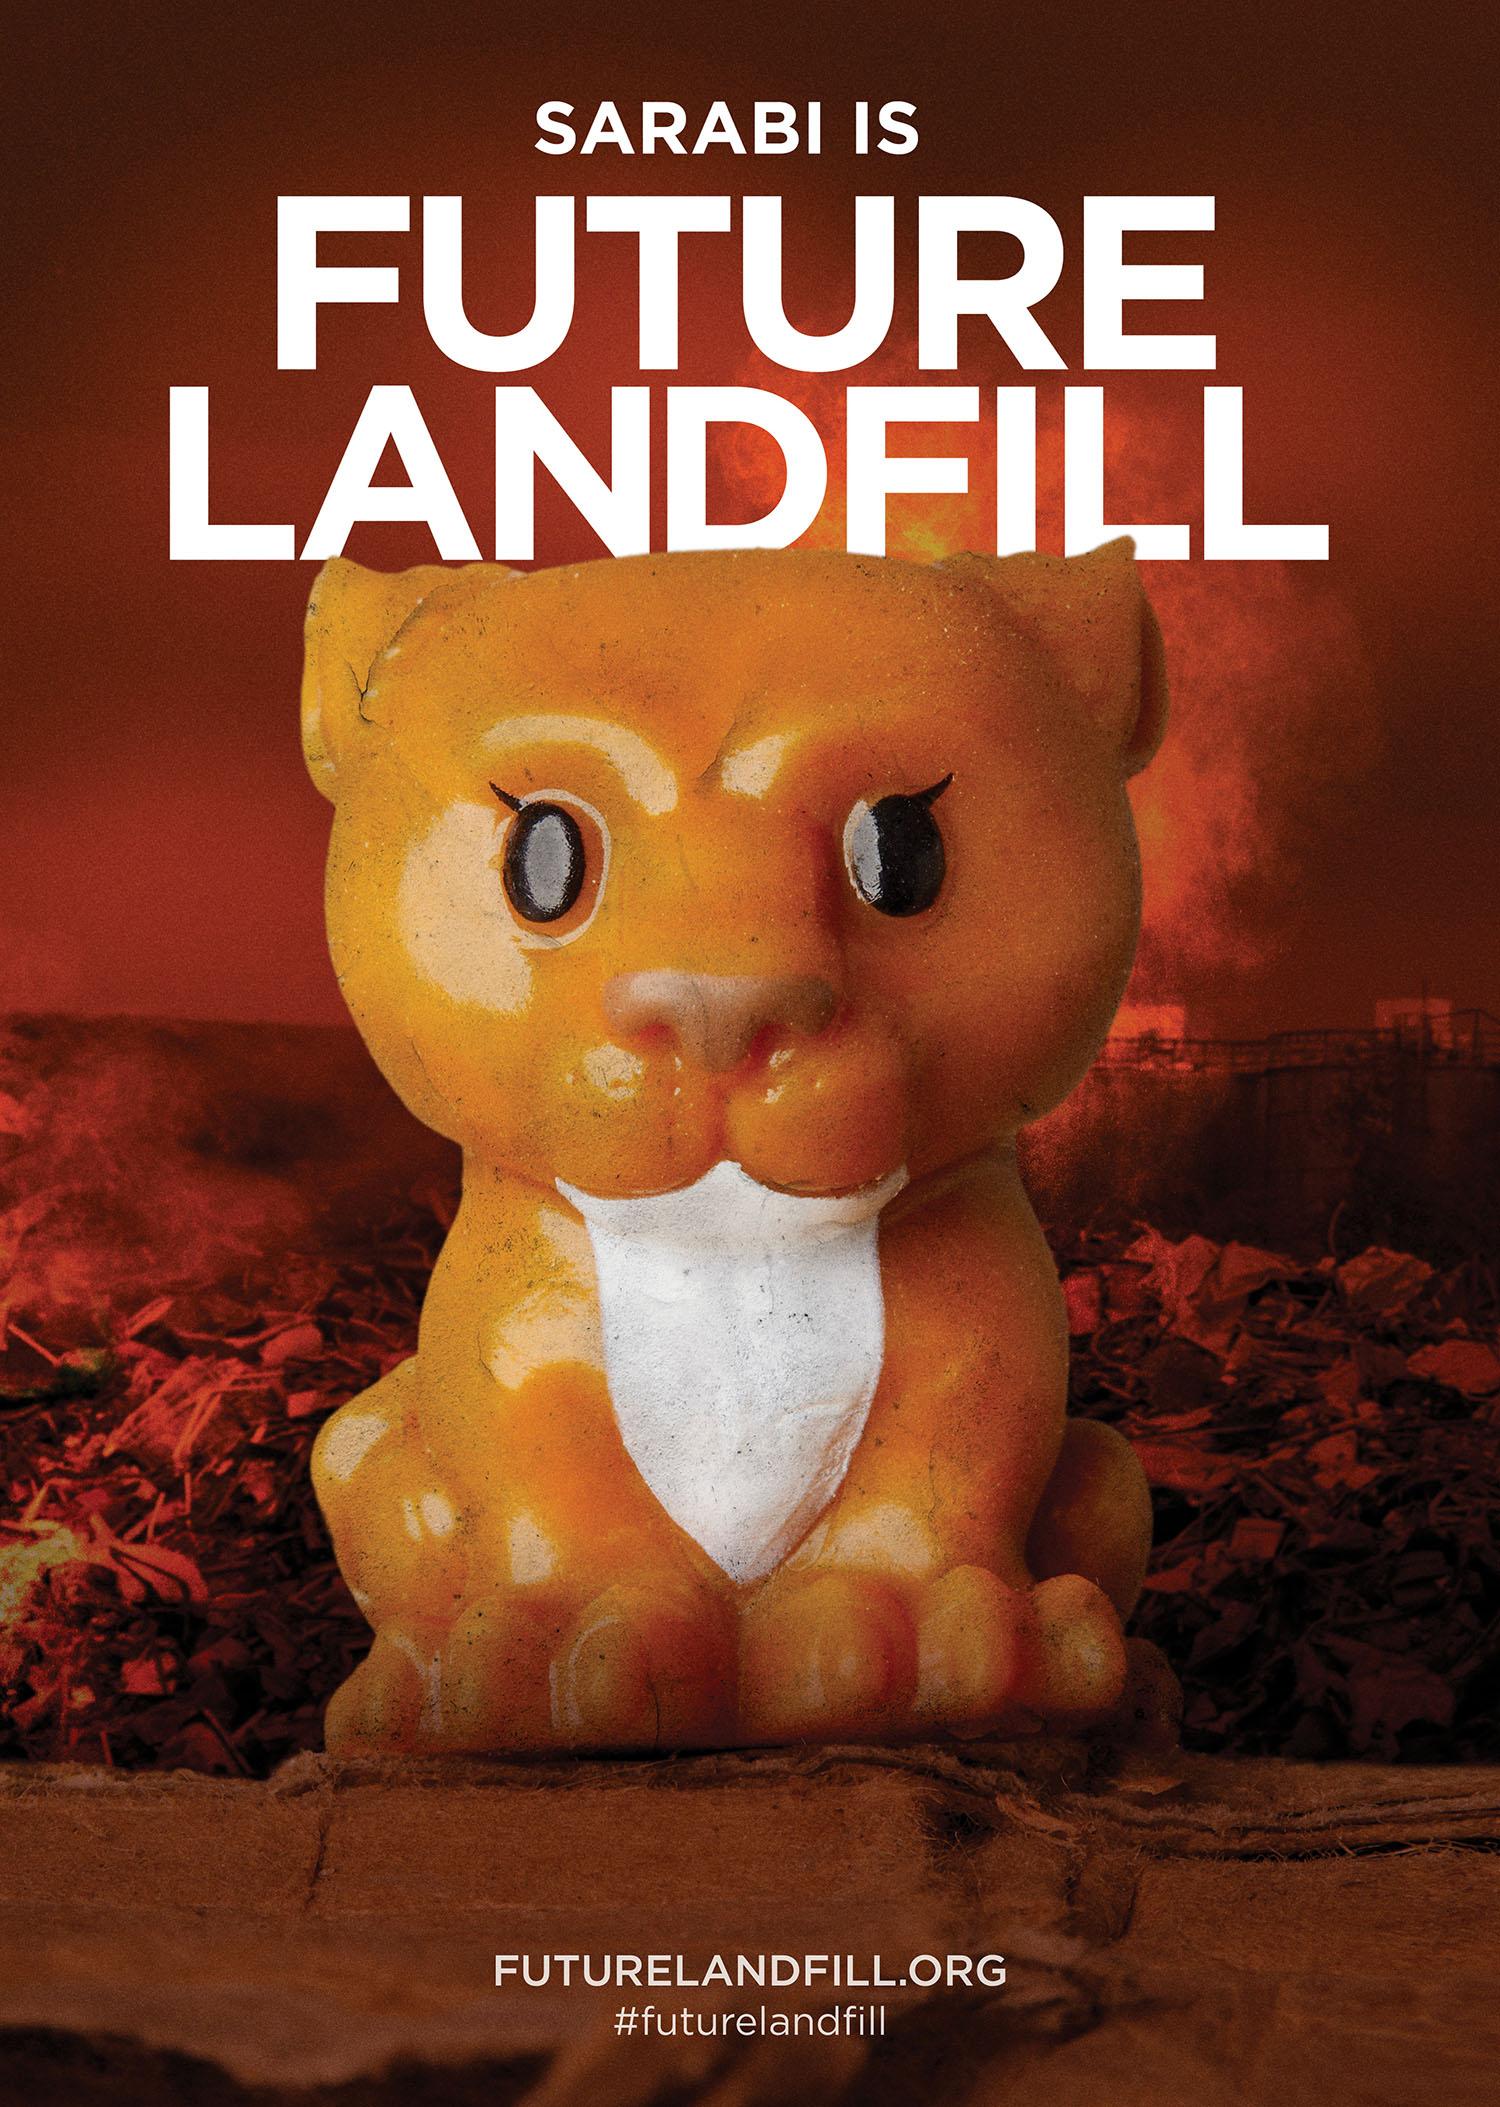 Future_Landfill_Master_Posters_WEB.jpg